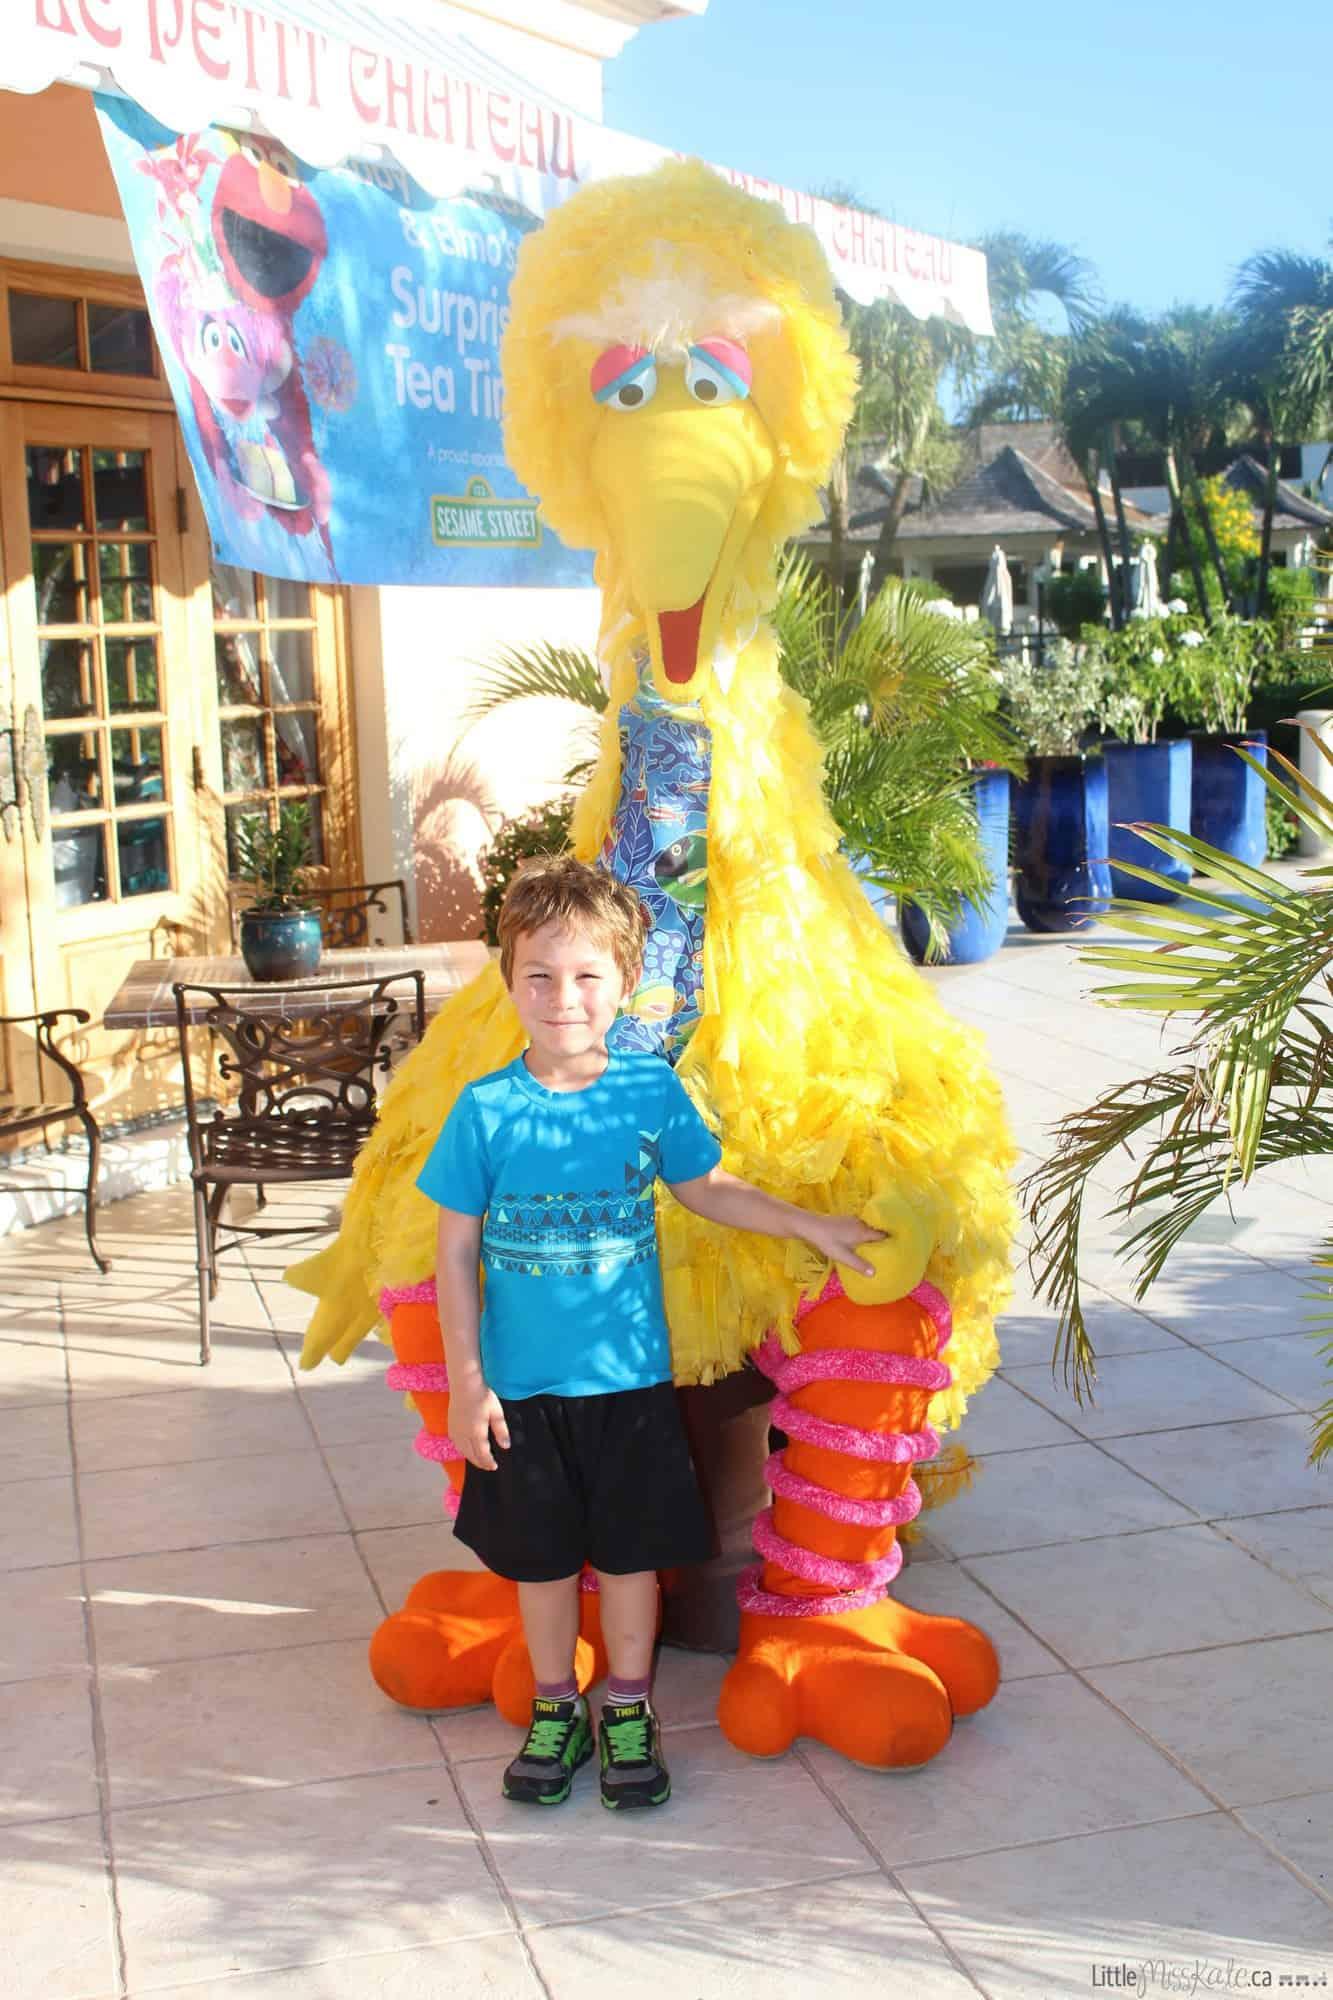 Beaches resort Turks and Caicos Sesame Street Characters via www.littlemisskate.ca